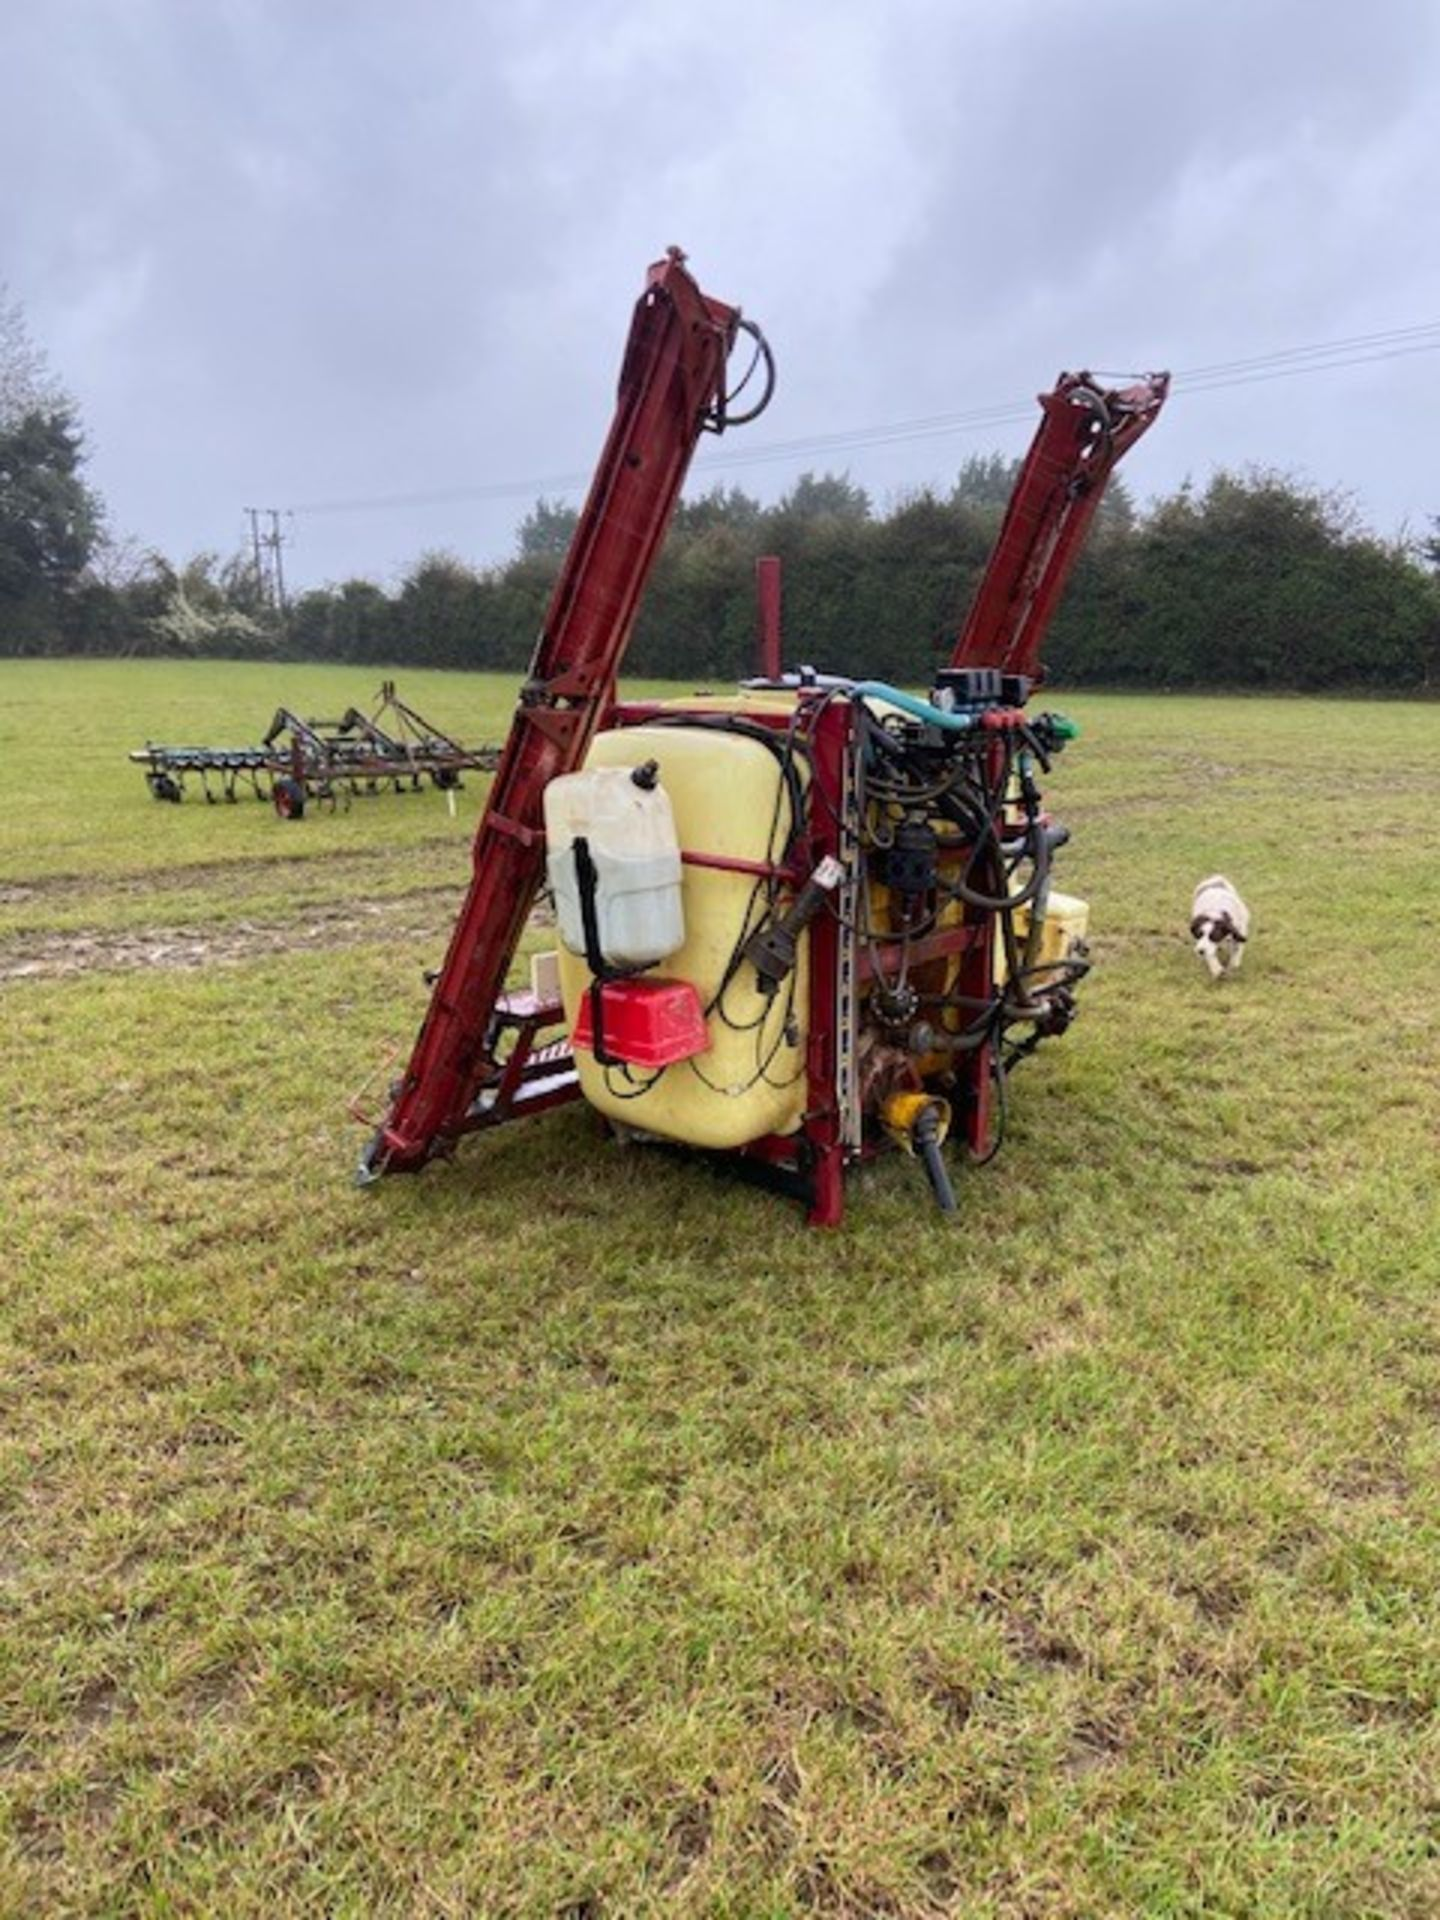 Hardi 12m sprayer hydraulic boom new pump with foam markers